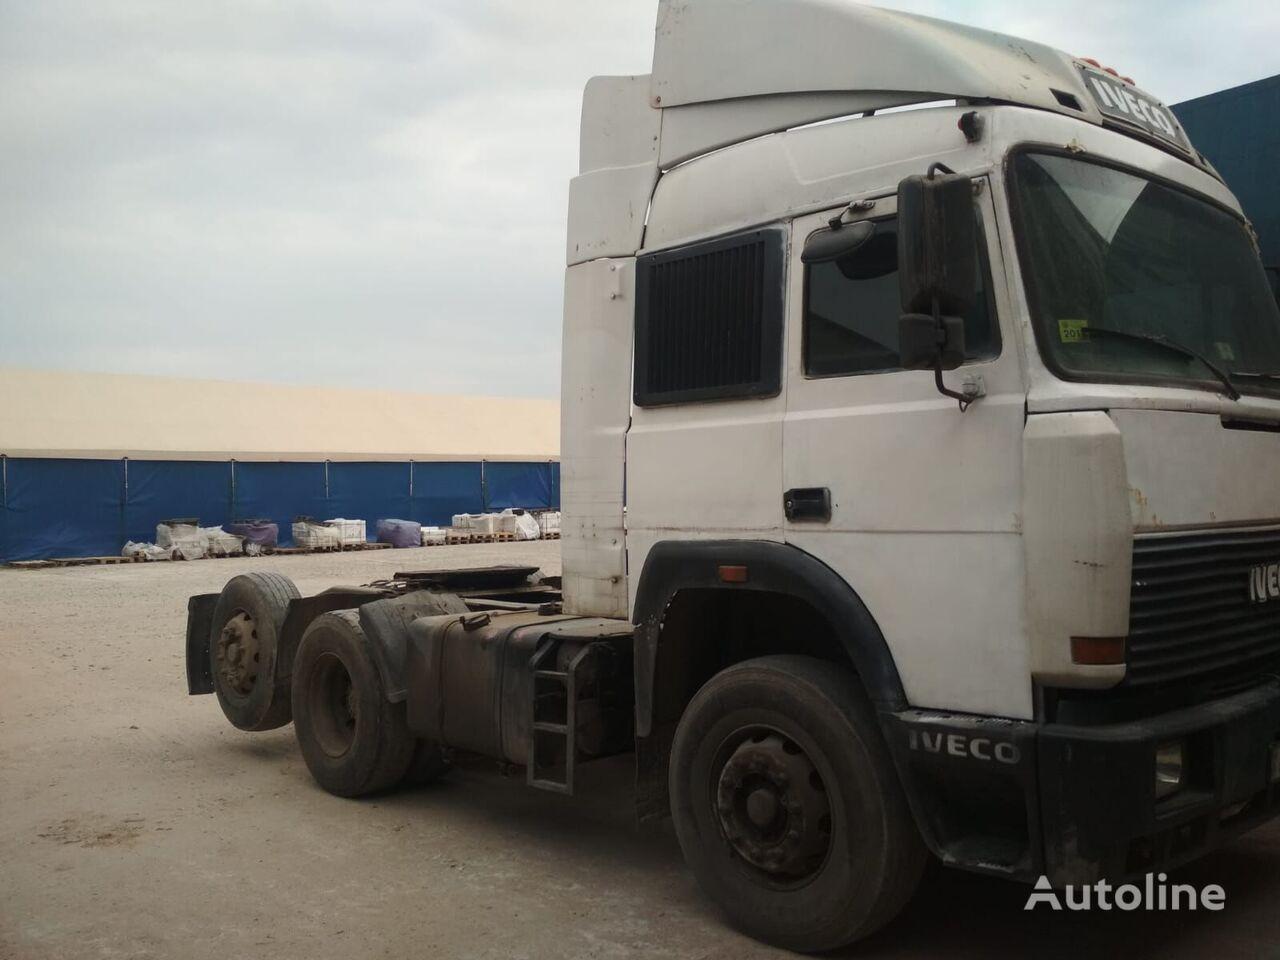 IVECO Turbostar 190 tractor unit